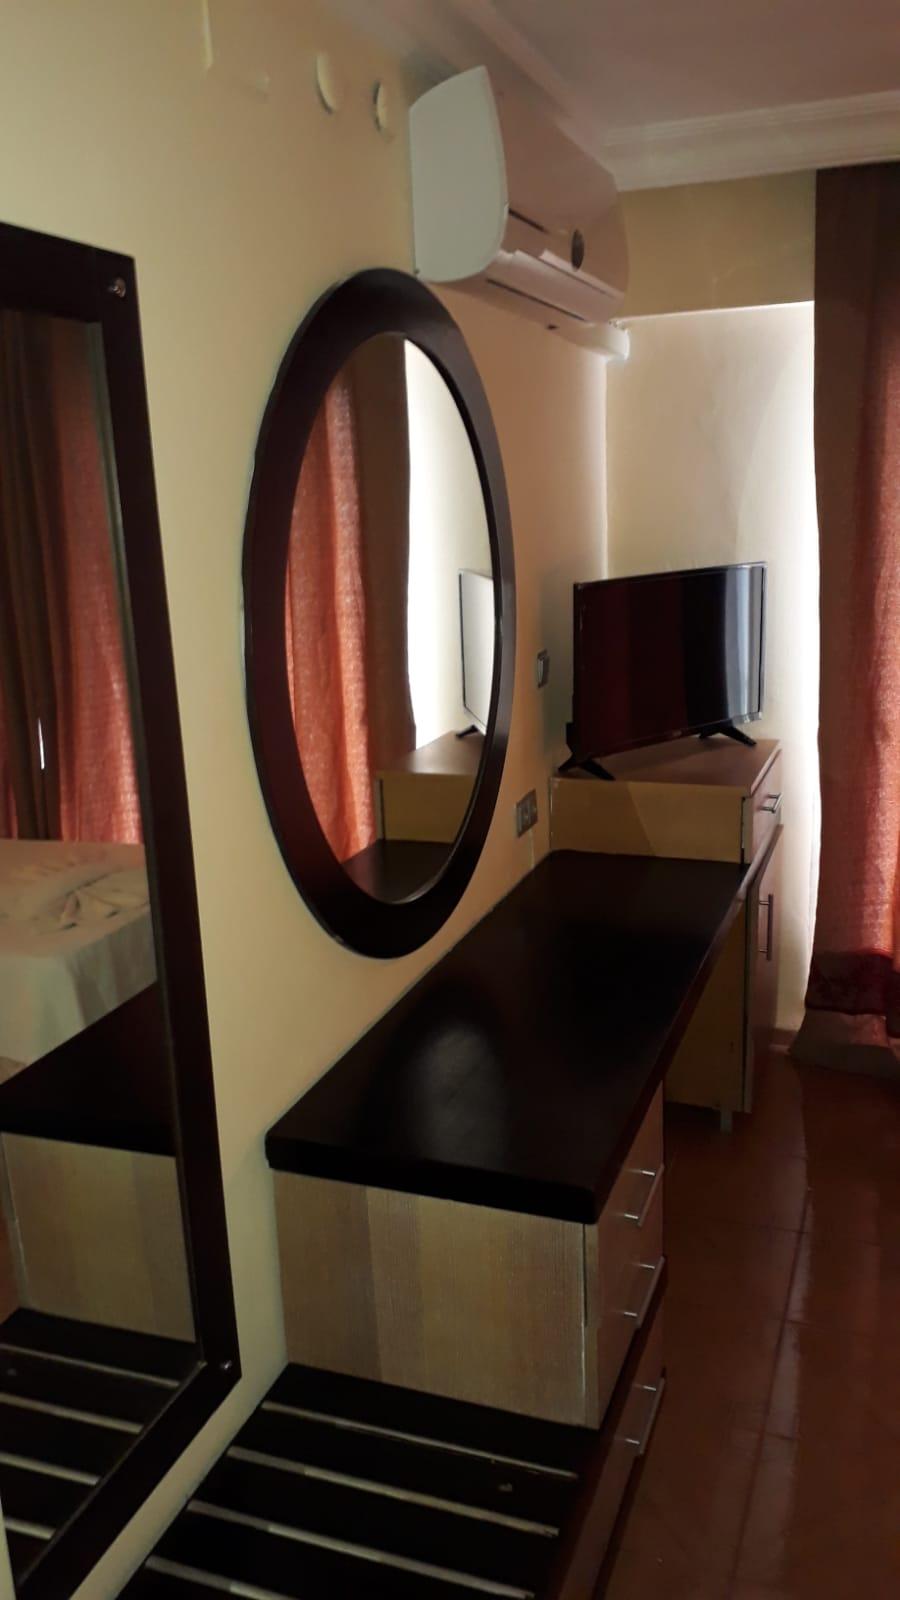 Letovanje Turska autobusom, Kusadasi, Hotel Santur,deo sobe u hotelu